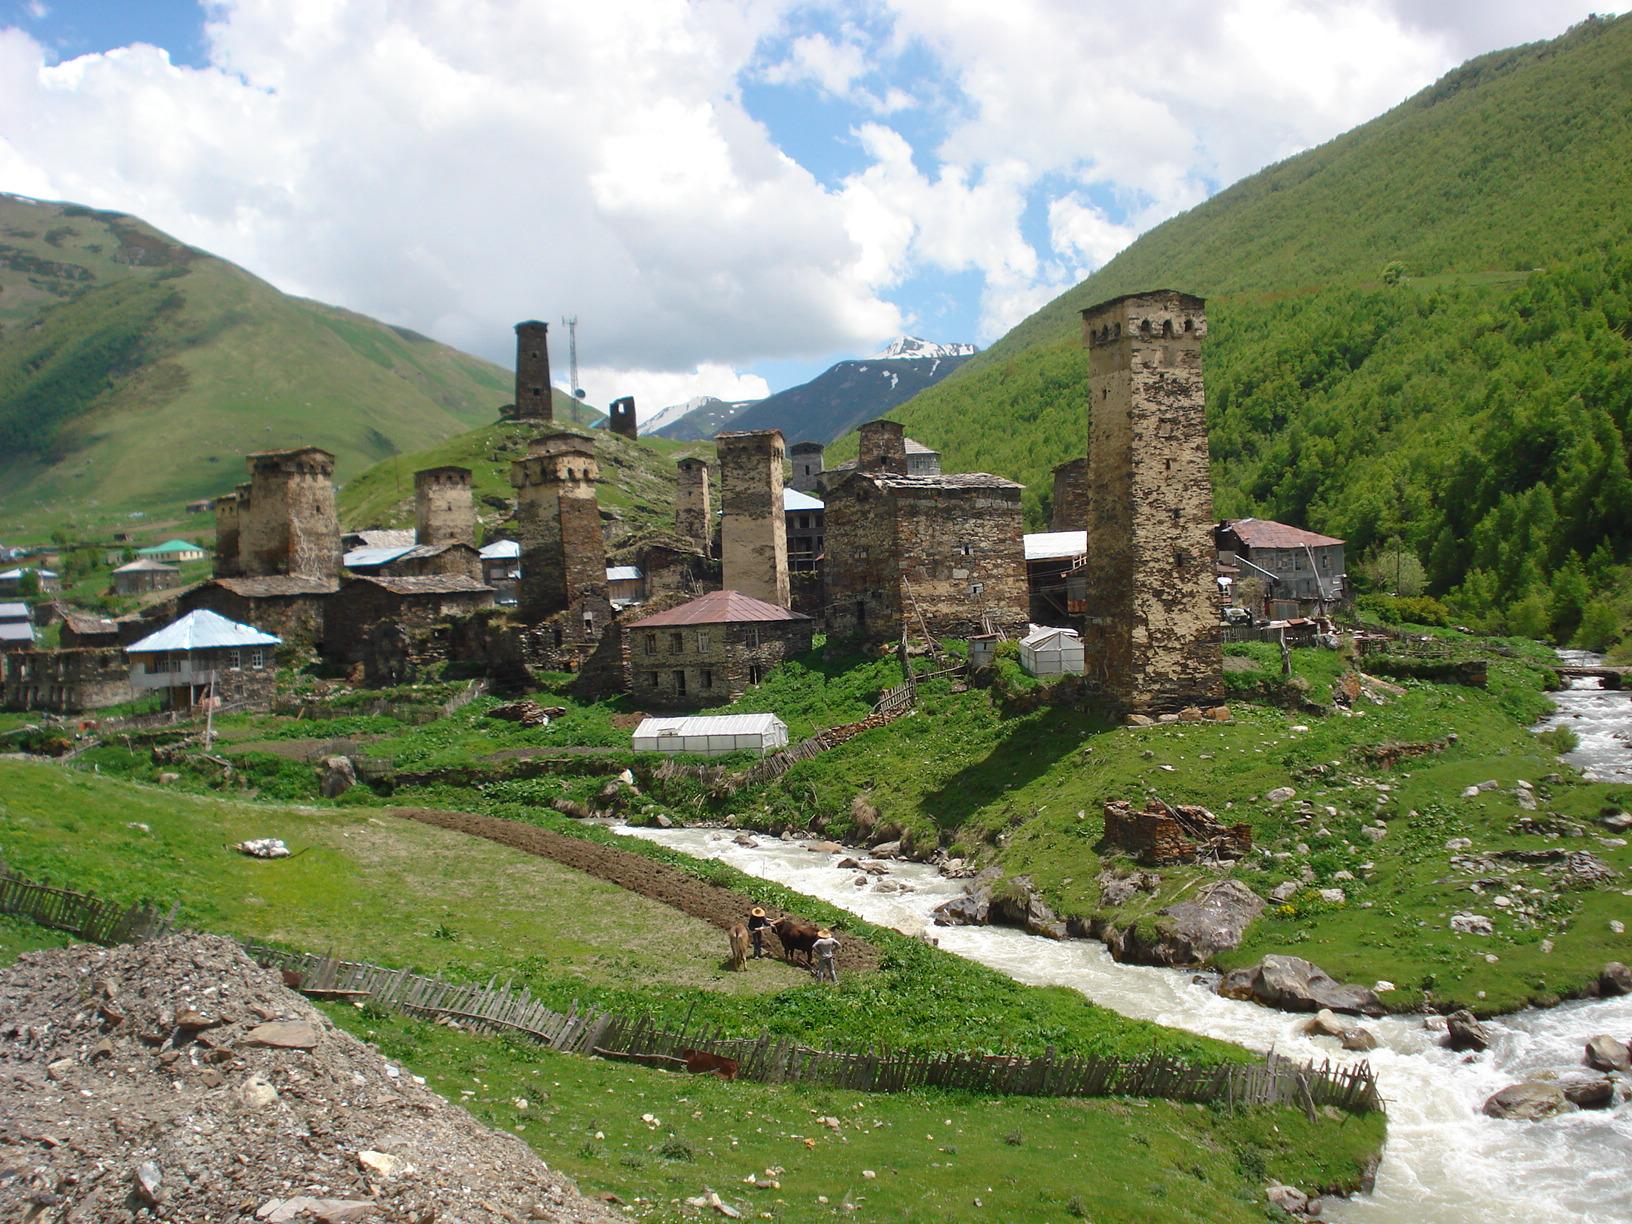 Ushguli located in Svaneti region of Georgia, close to Russian border. Spectacular mountainous setting among 9th Century watchtowers